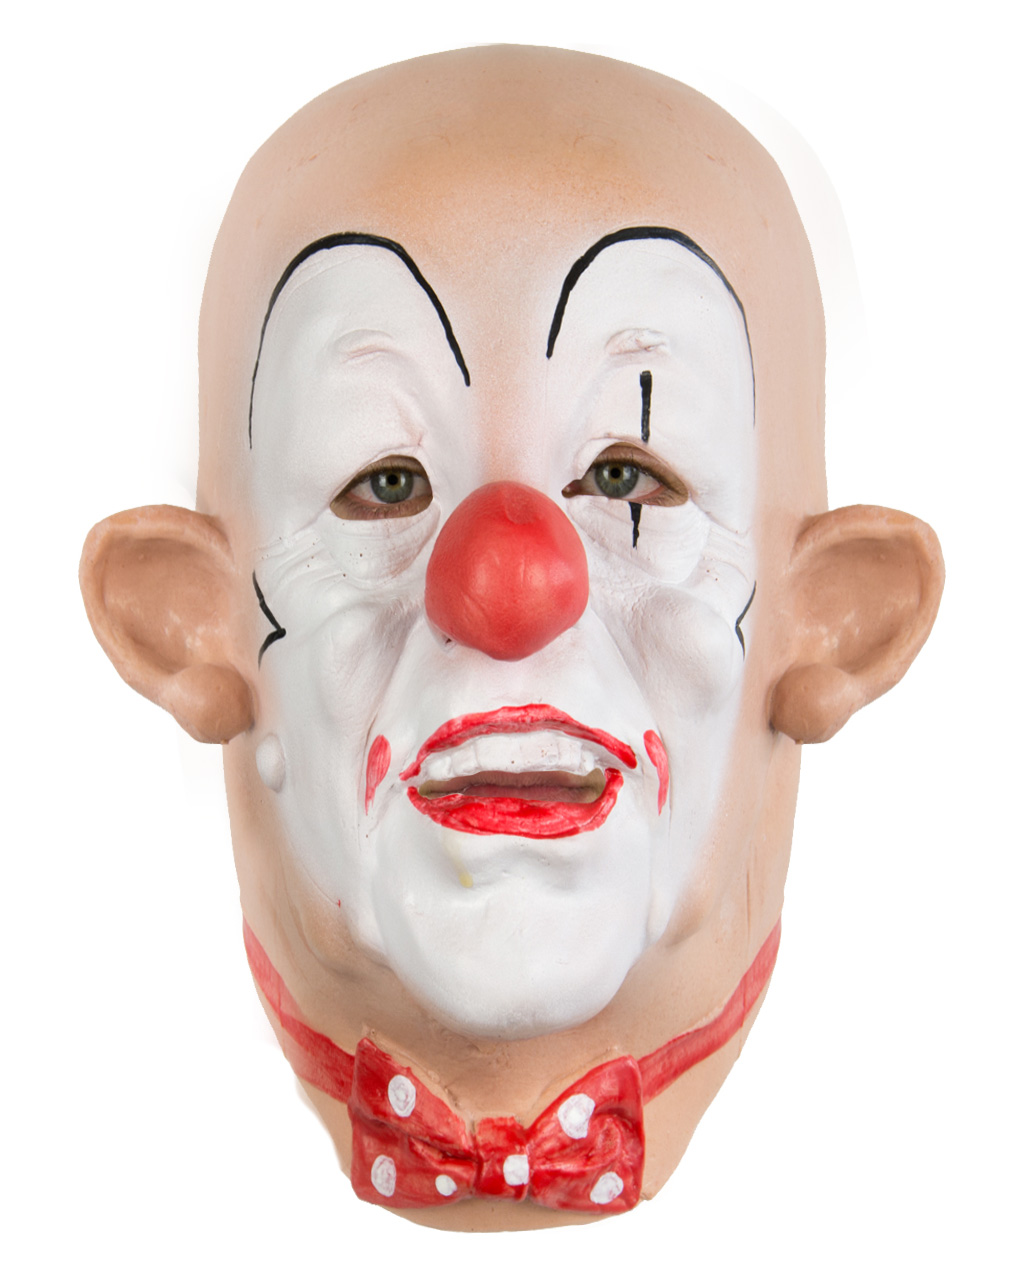 Scary Clown Mask Halloween Party Carnival Fancy Dress Horror Costume Face Hide